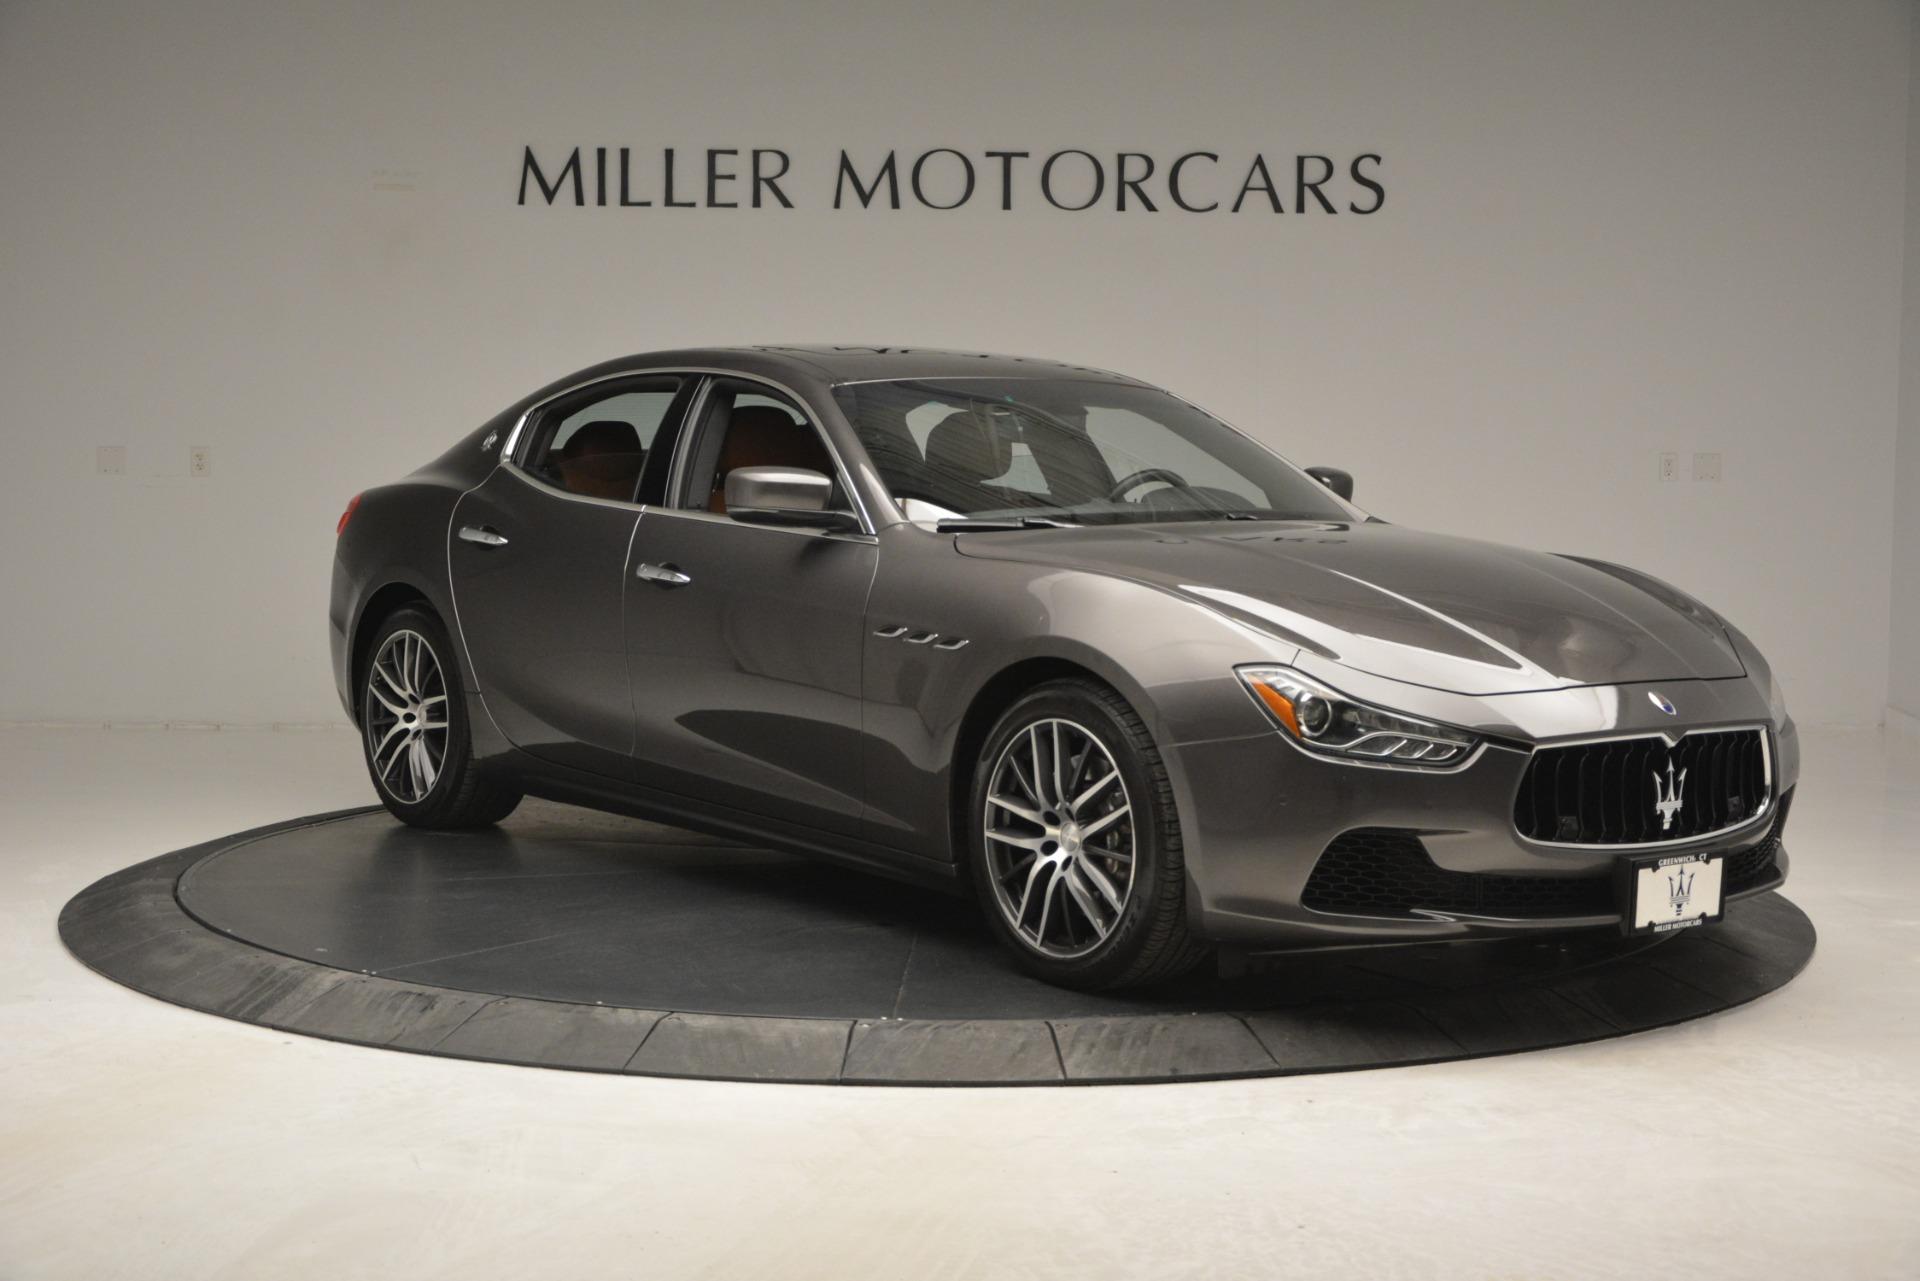 Used 2015 Maserati Ghibli S Q4 For Sale In Greenwich, CT 2941_p12